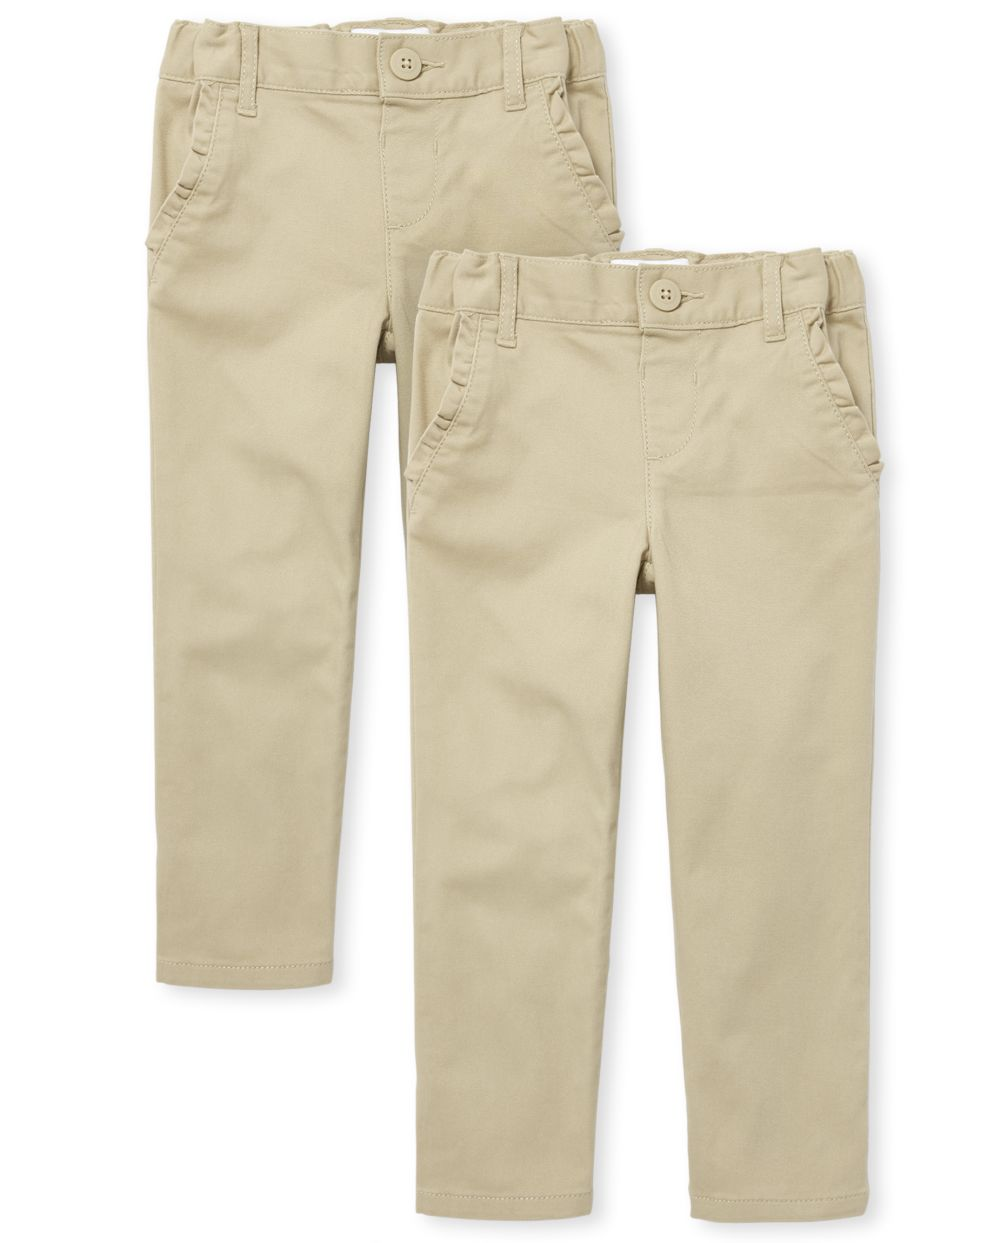 Toddler Girls Uniform Skinny Chino Pants 2-Pack